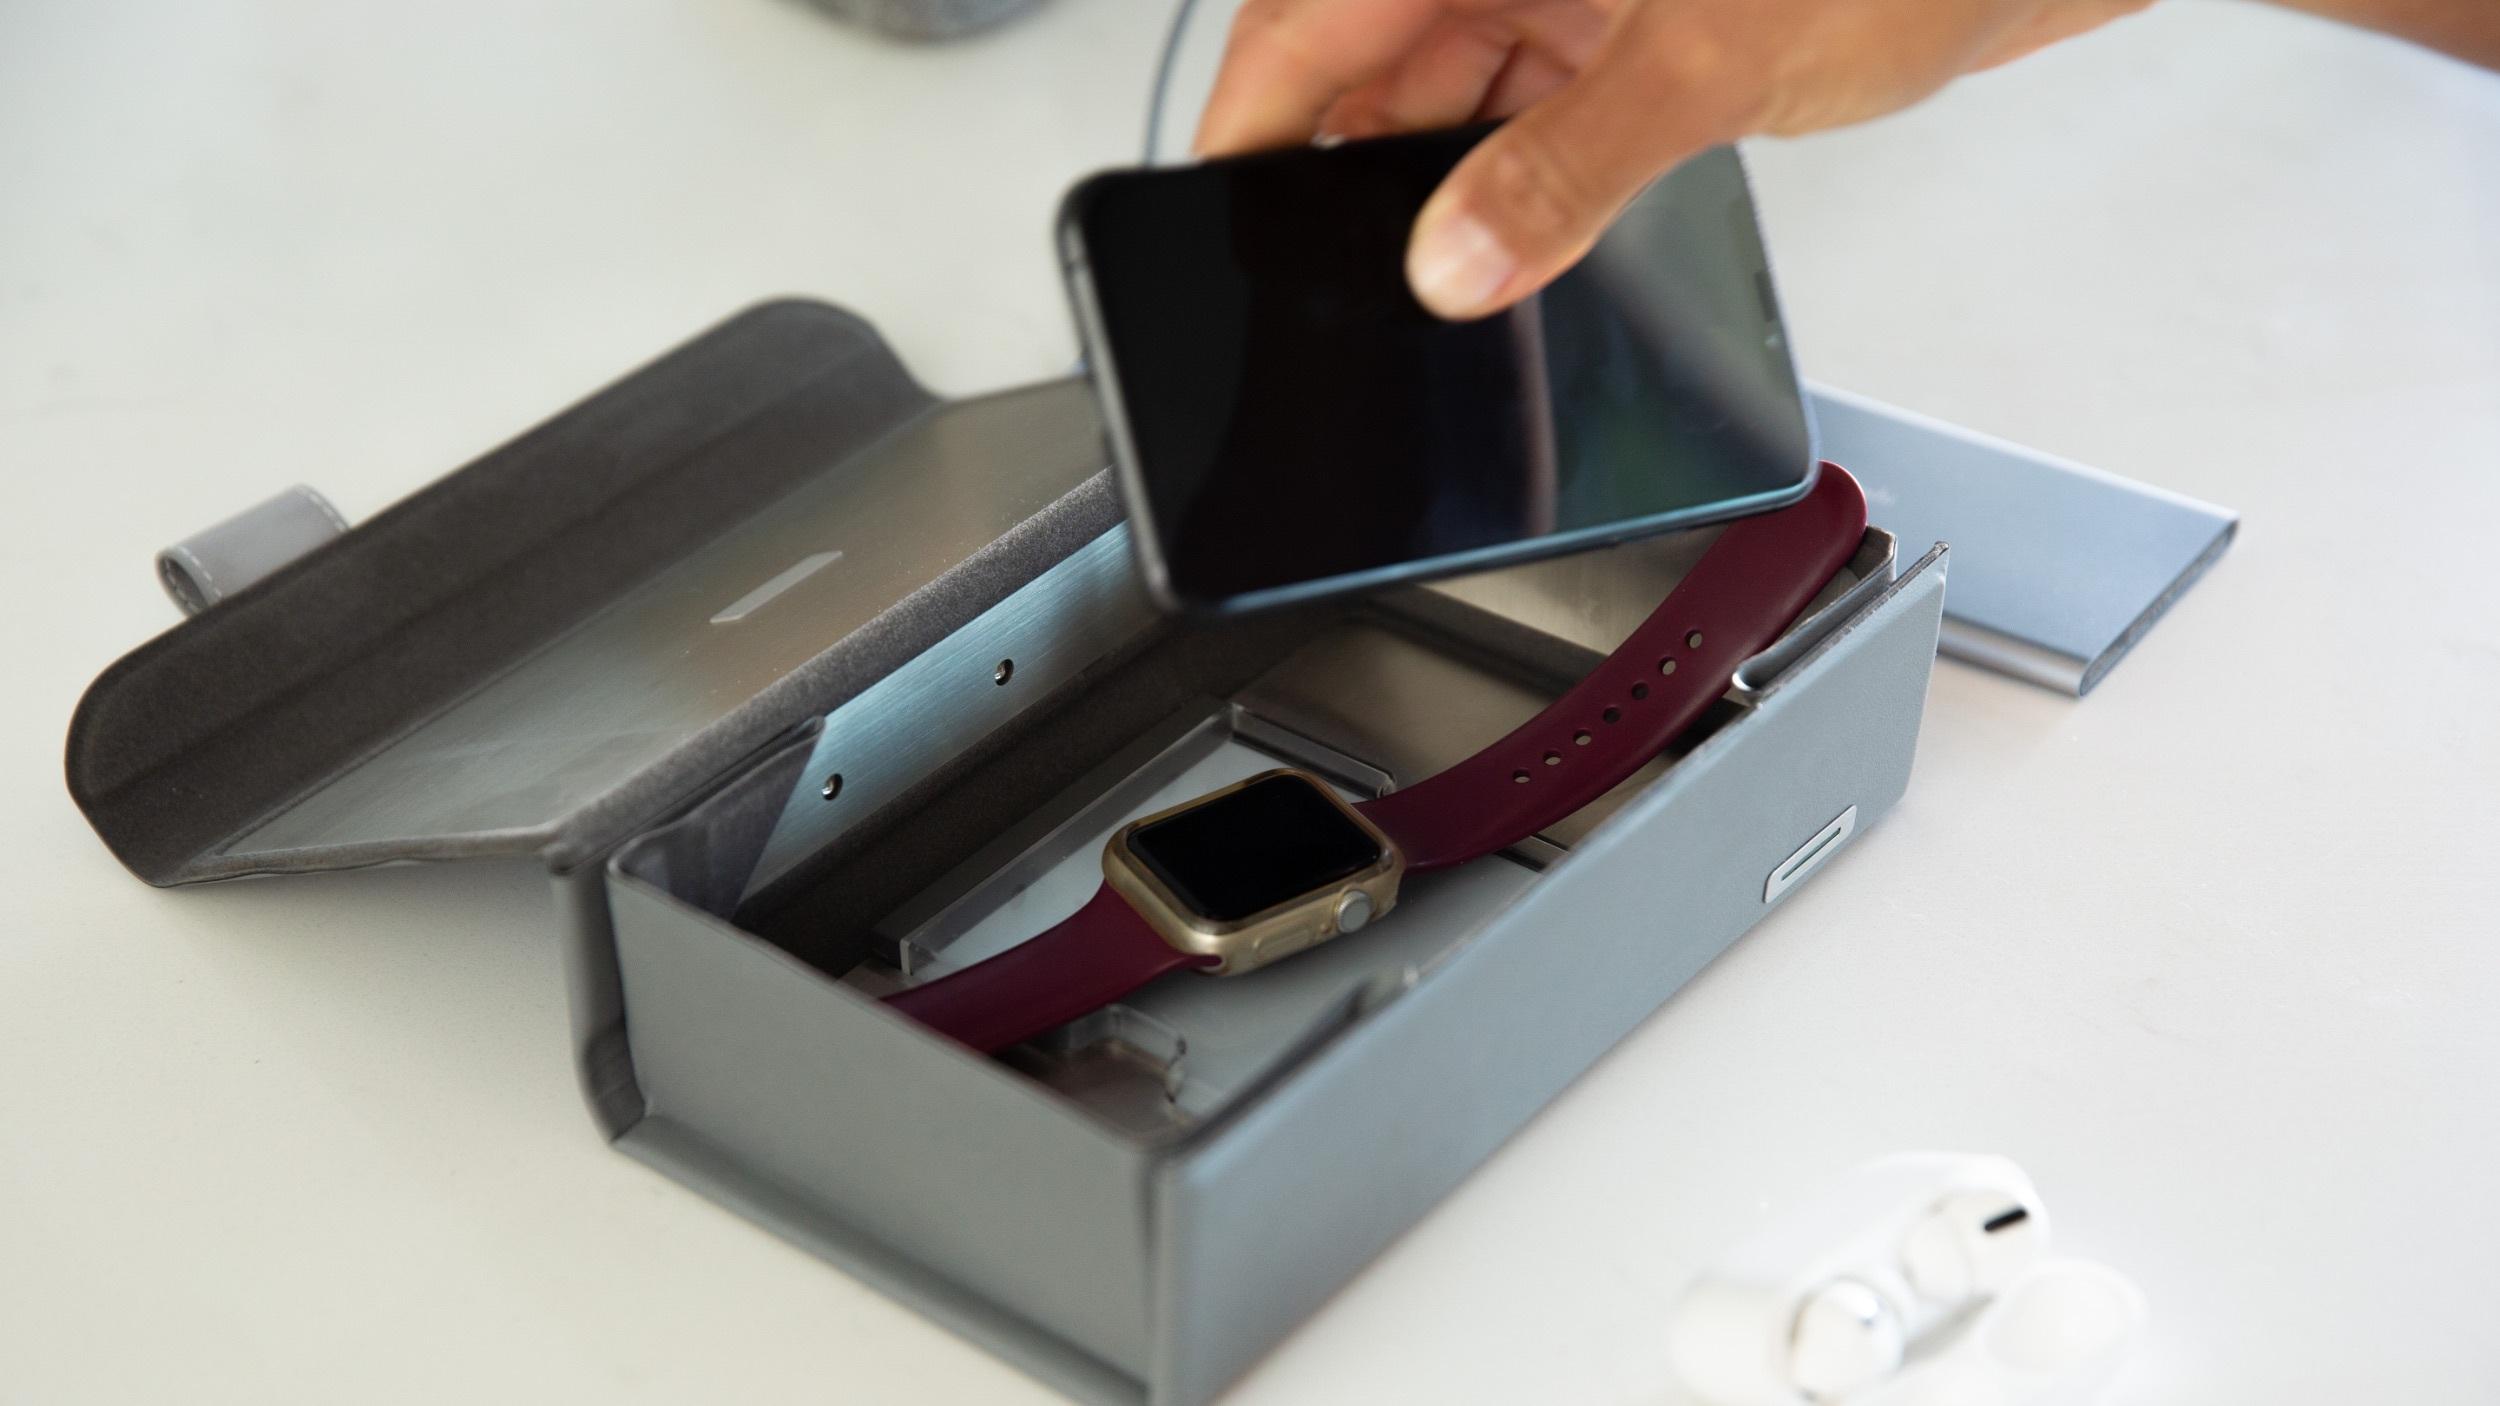 Placing a smartphone into a Moshi Deep Purple UV sanitizer